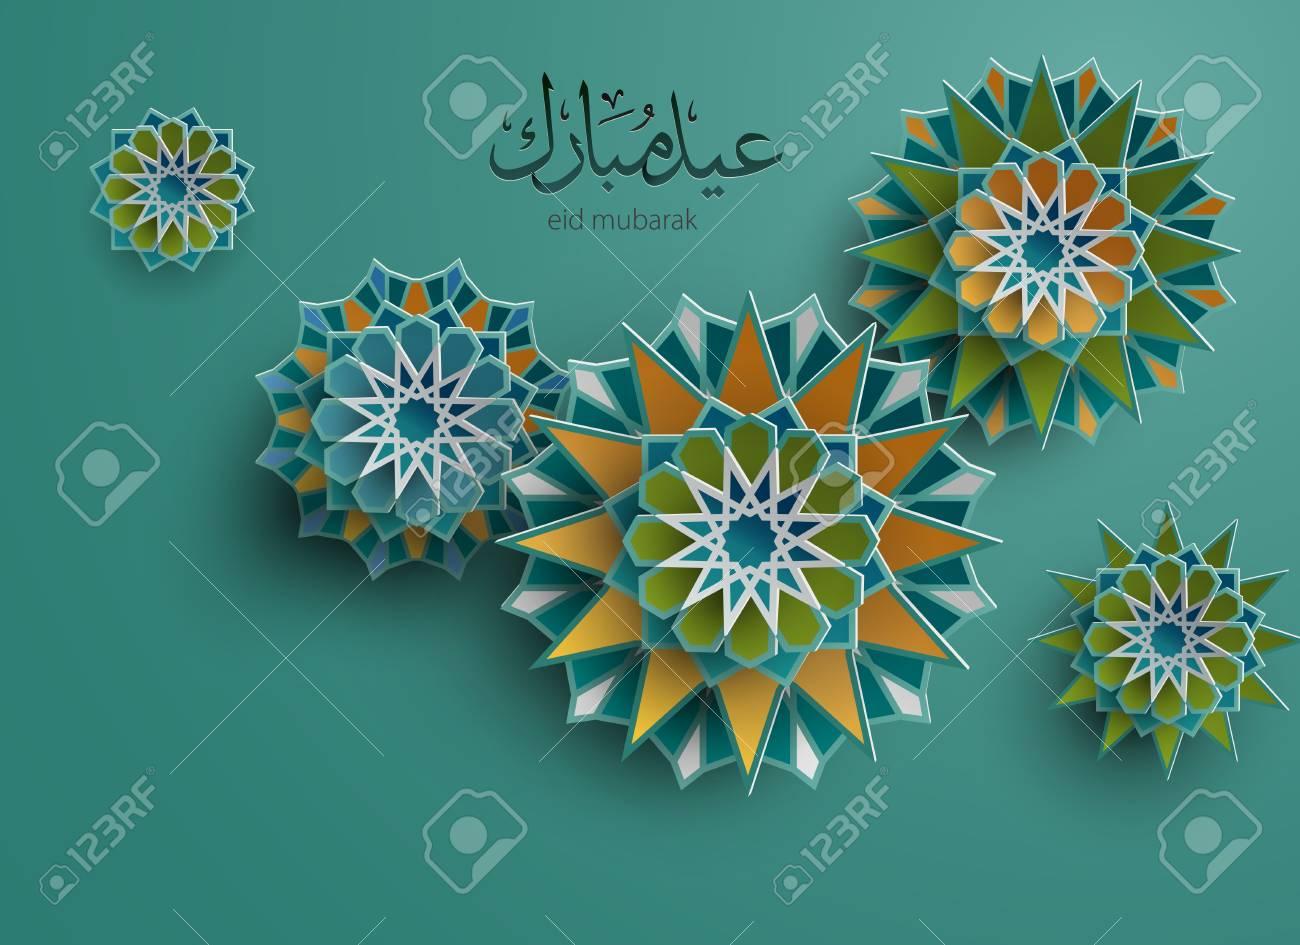 Ramadan graphic in green backdrop - 97413025